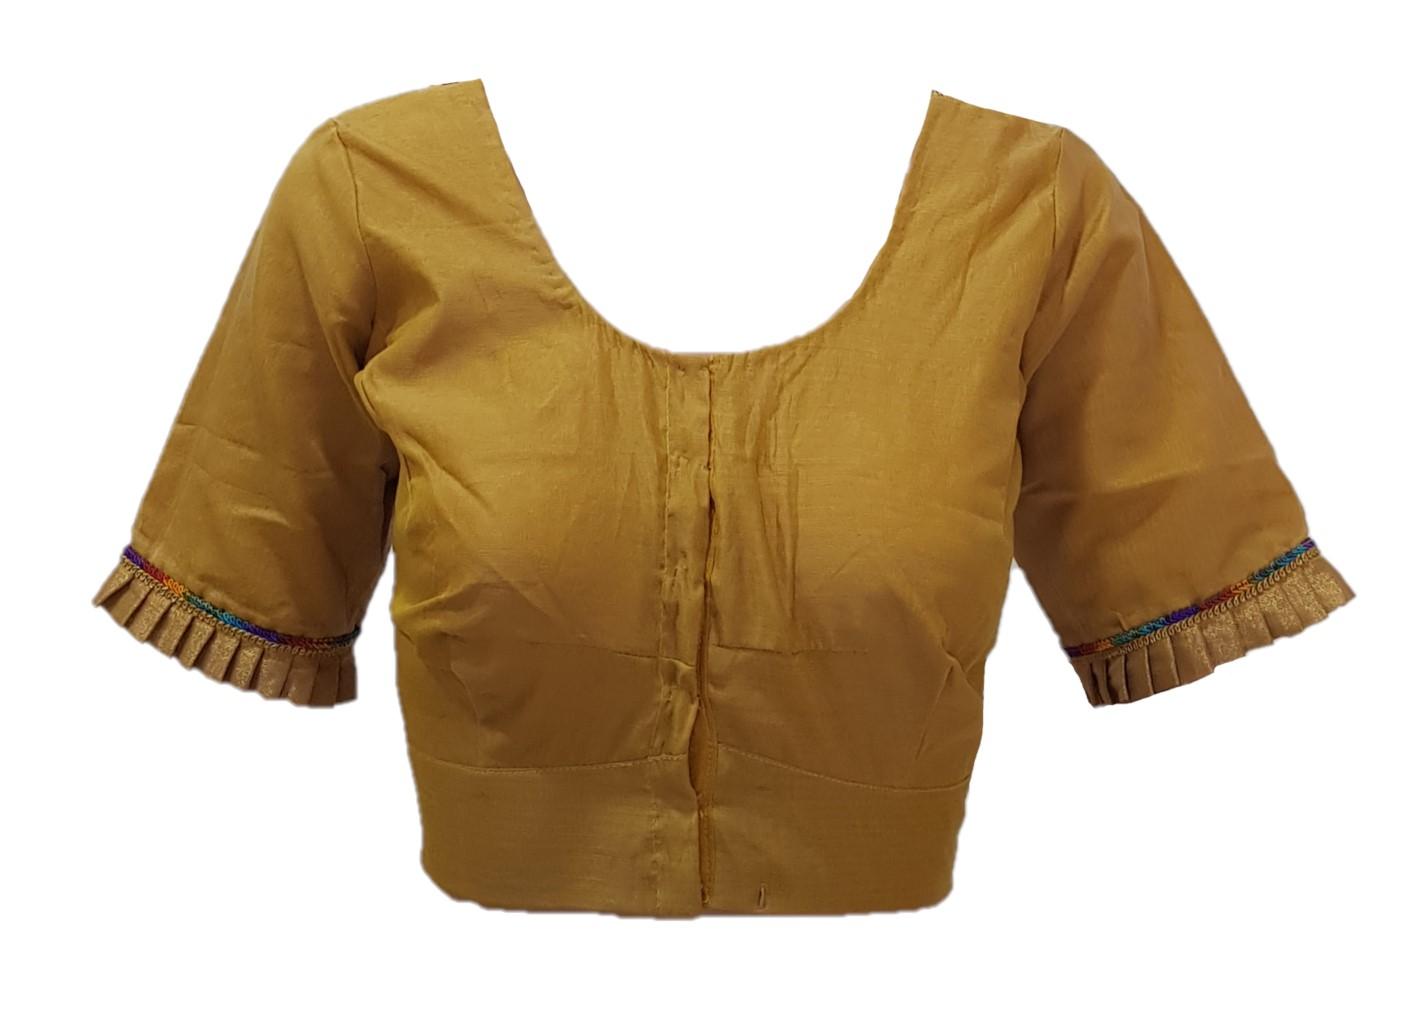 Mercerised Cotton Fabric Neck Frills Readymade Saree Blouse Khaki Size XL : Picture